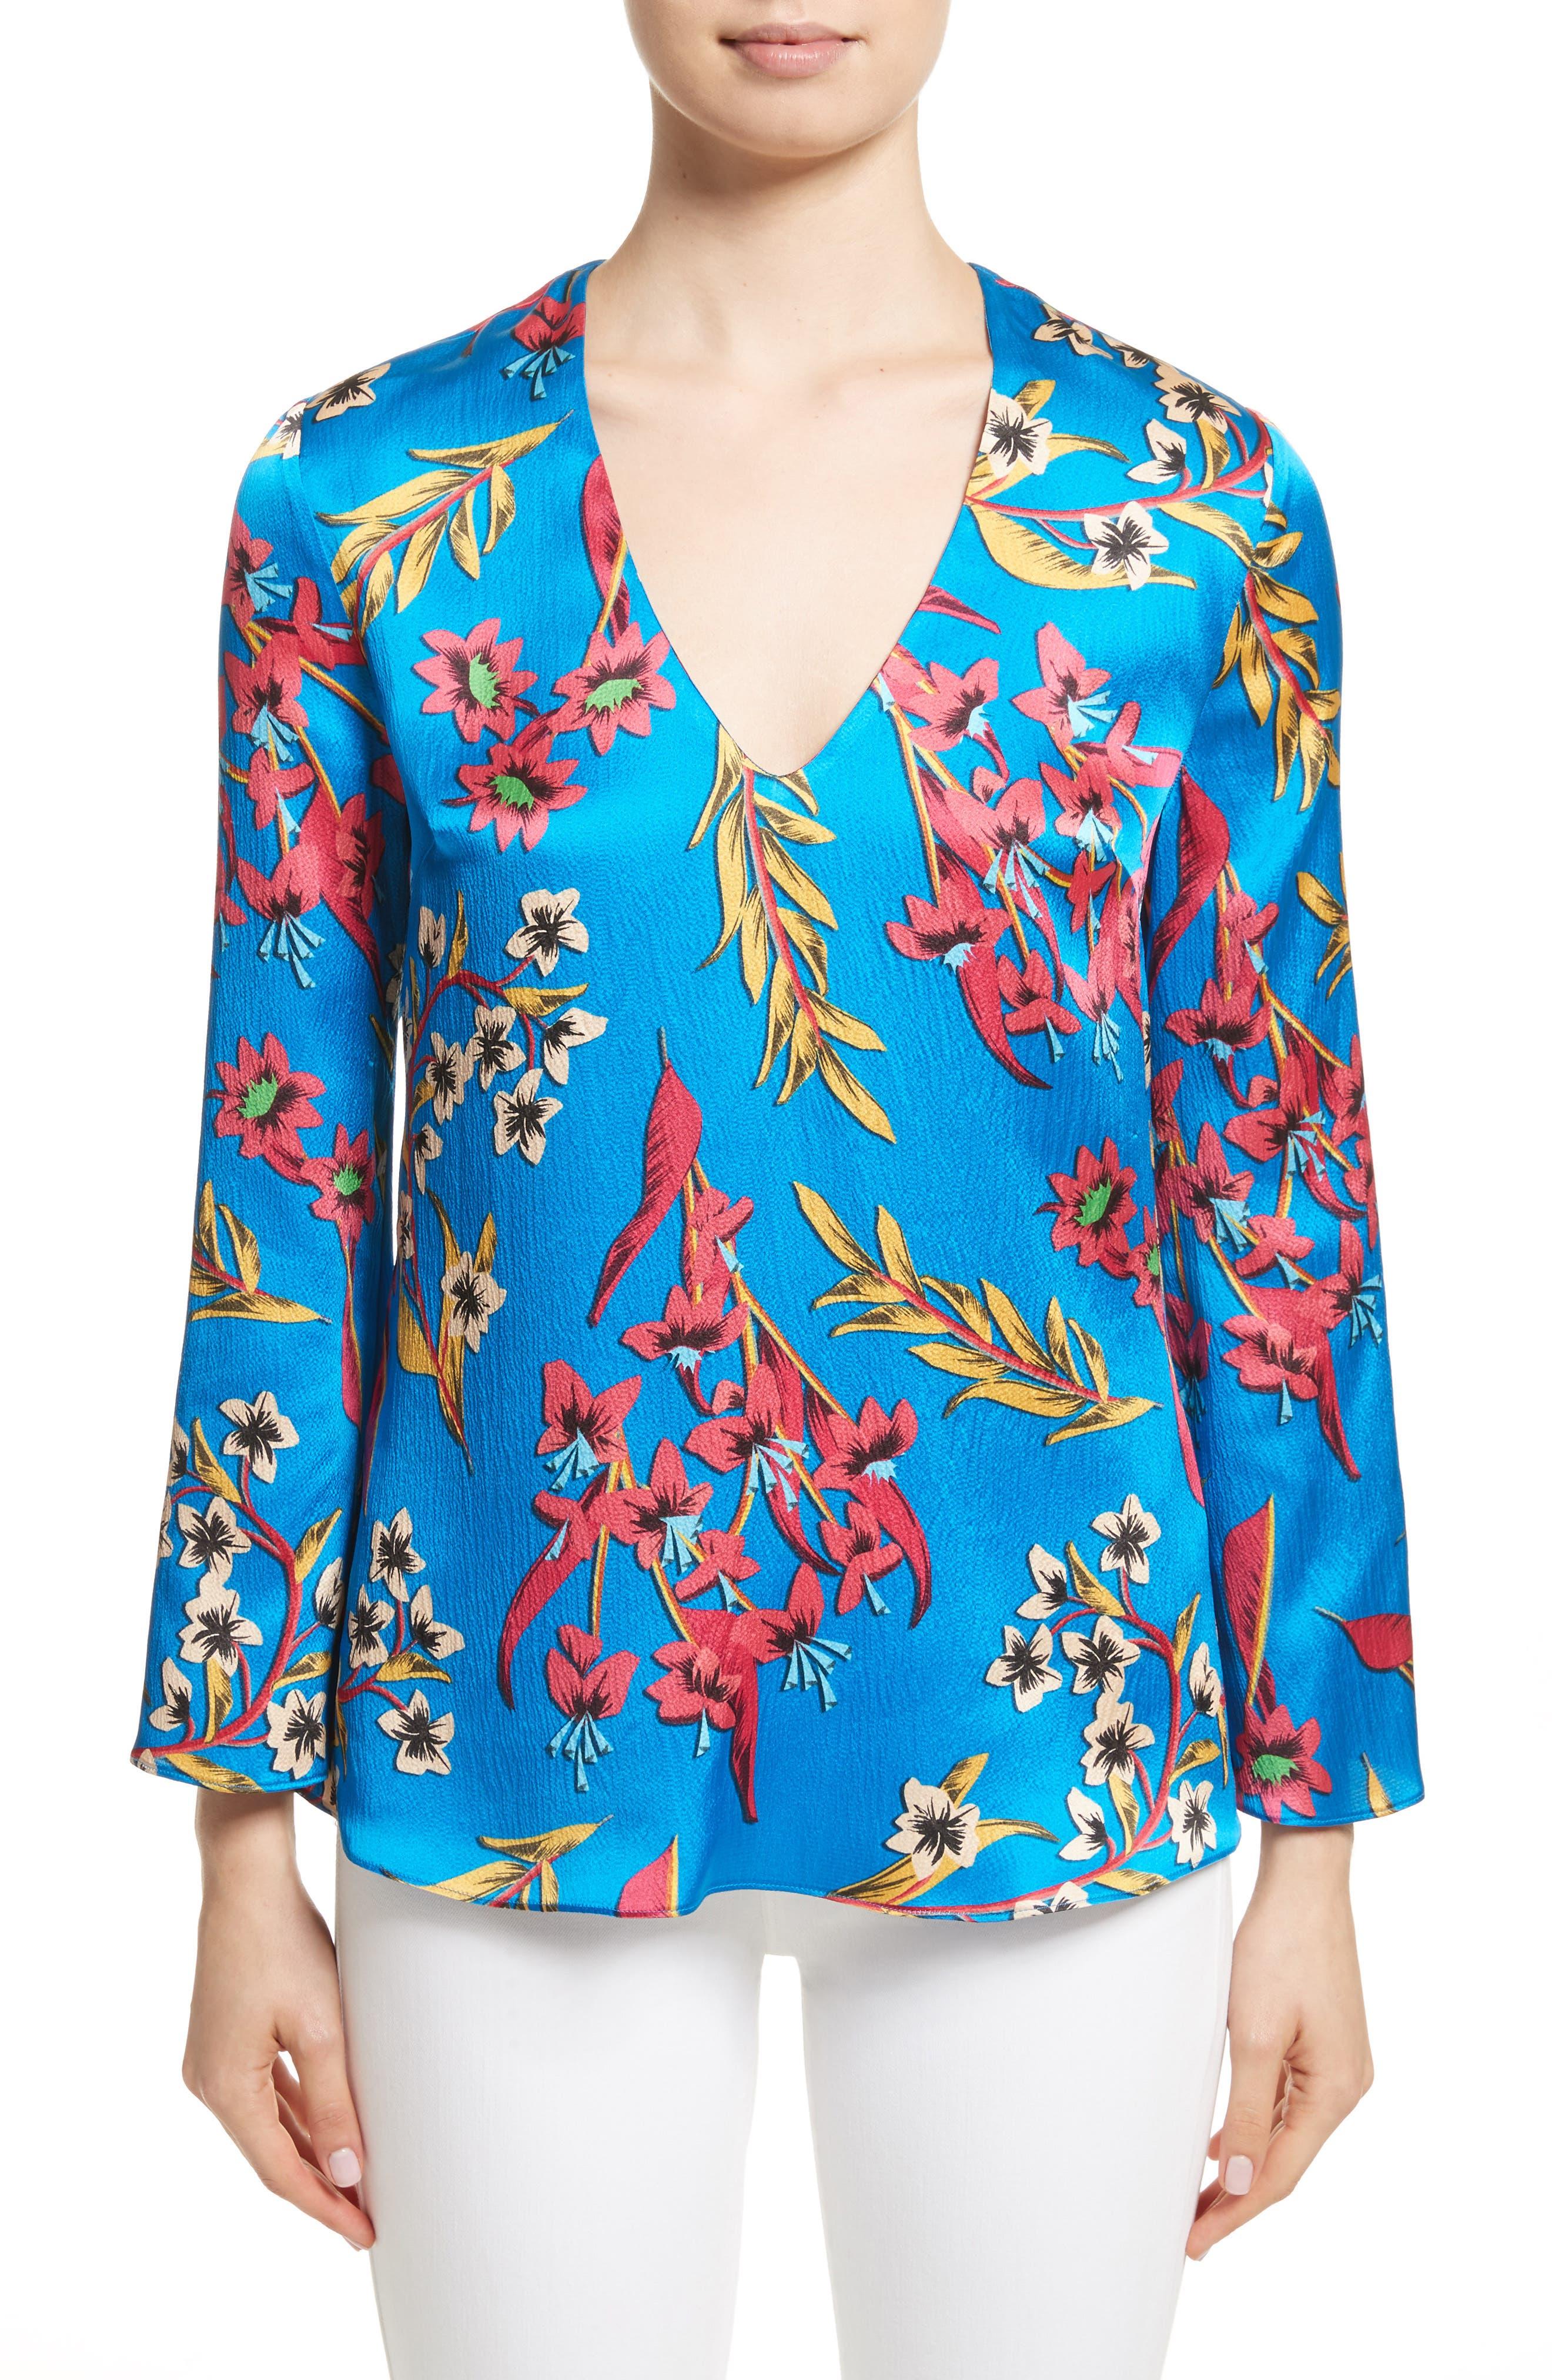 Alternate Image 1 Selected - Etro Jungle Floral Print Silk Blouse